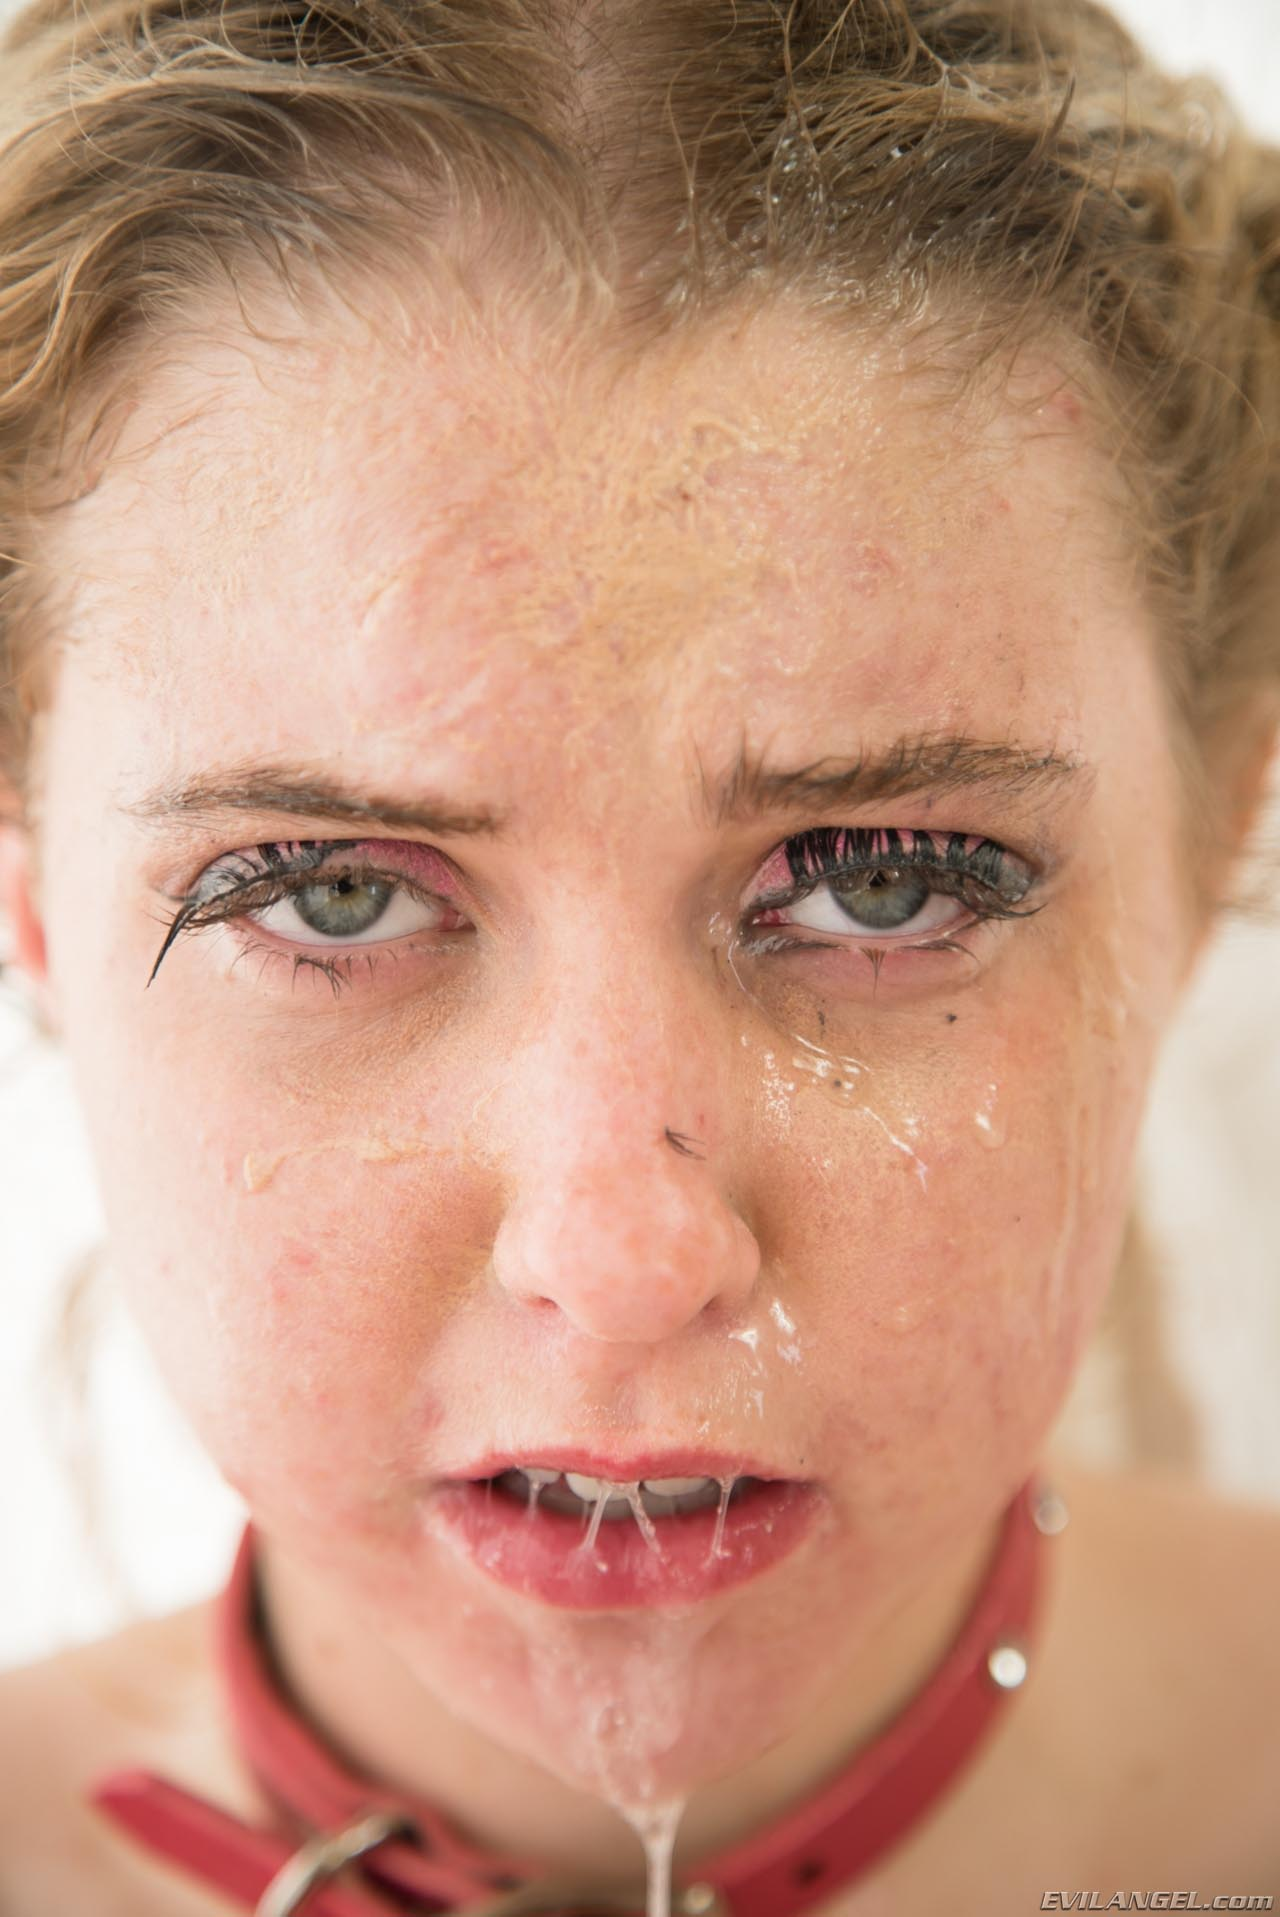 Photo 15 Of 15 Hookup Hotshot: Be A Slut, Do Whatever U Want